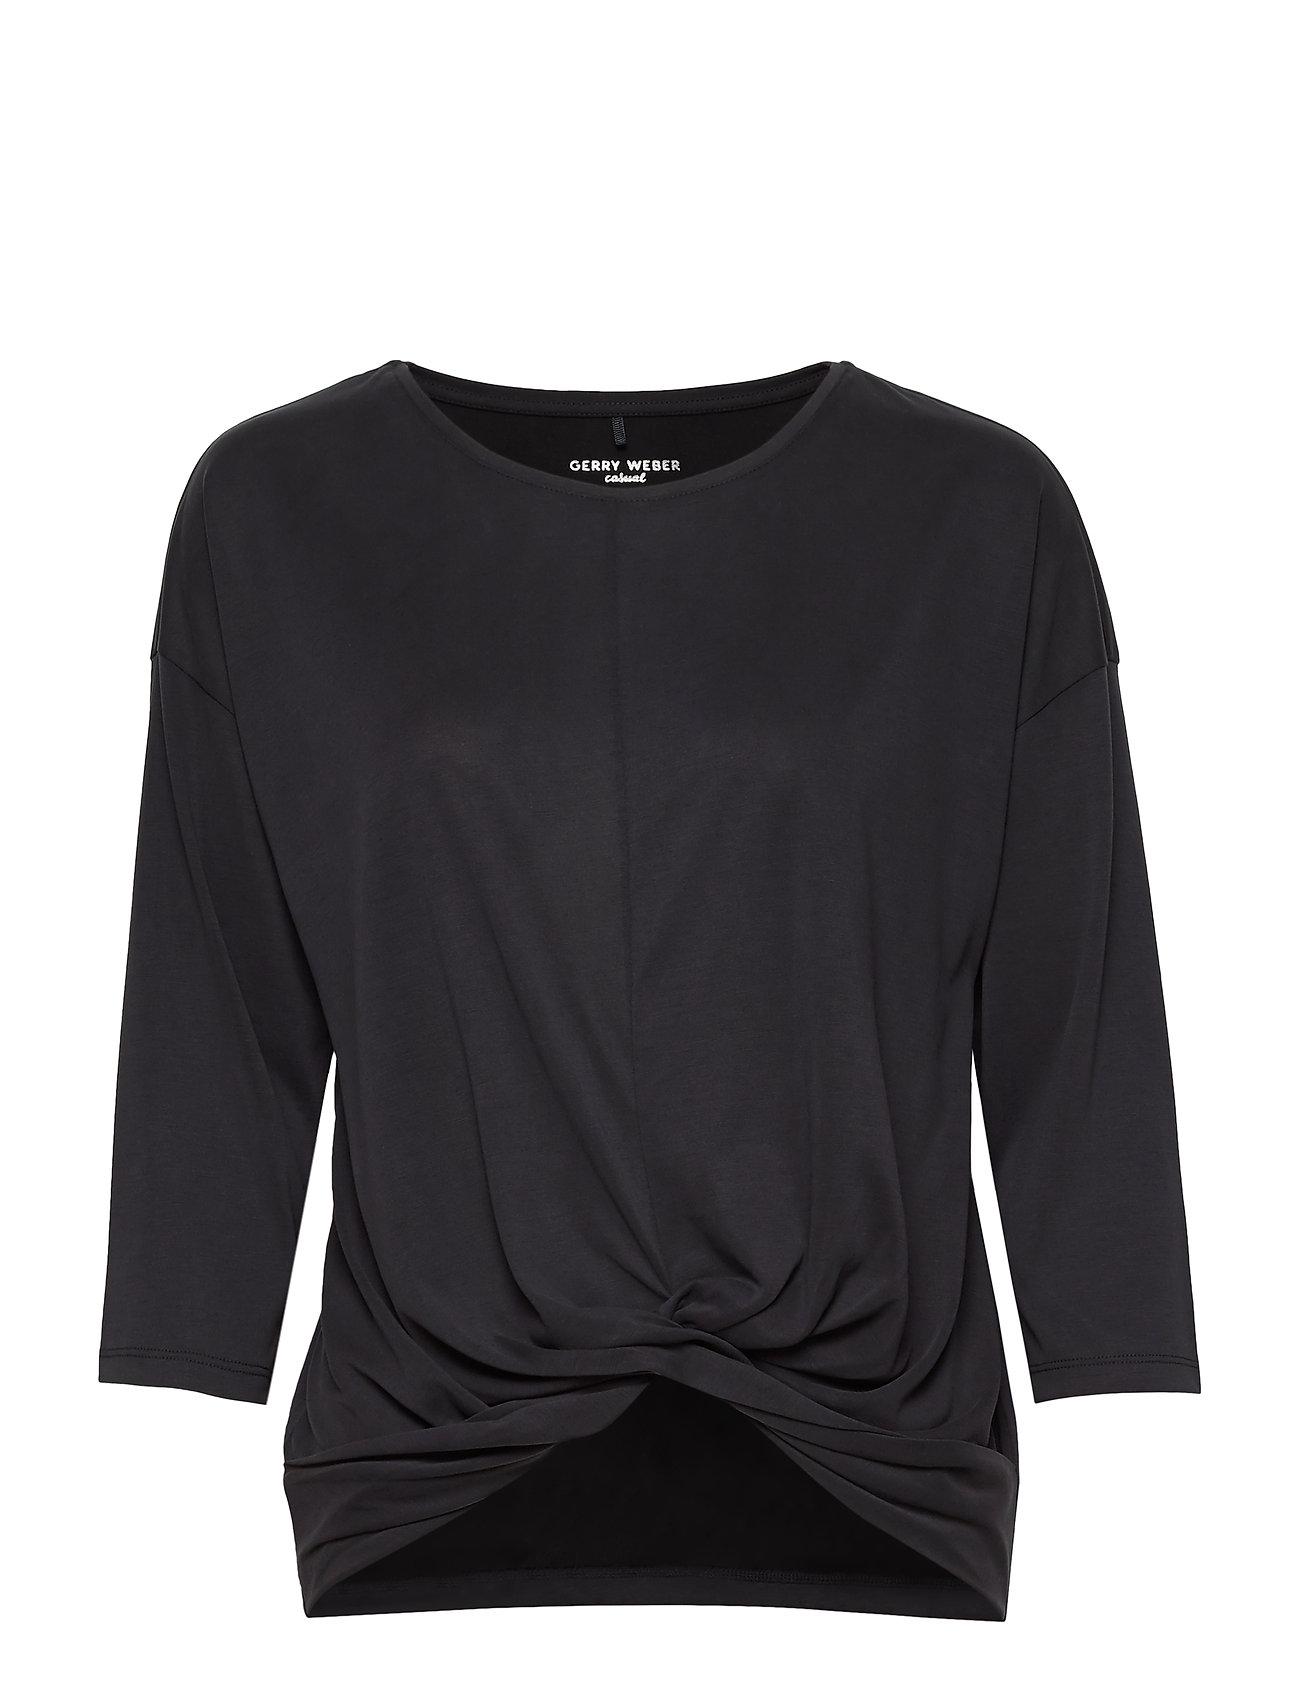 Image of T-Shirt 3/4-Sleeve R Langærmet T-shirt Sort Gerry Weber Edition (3326810587)